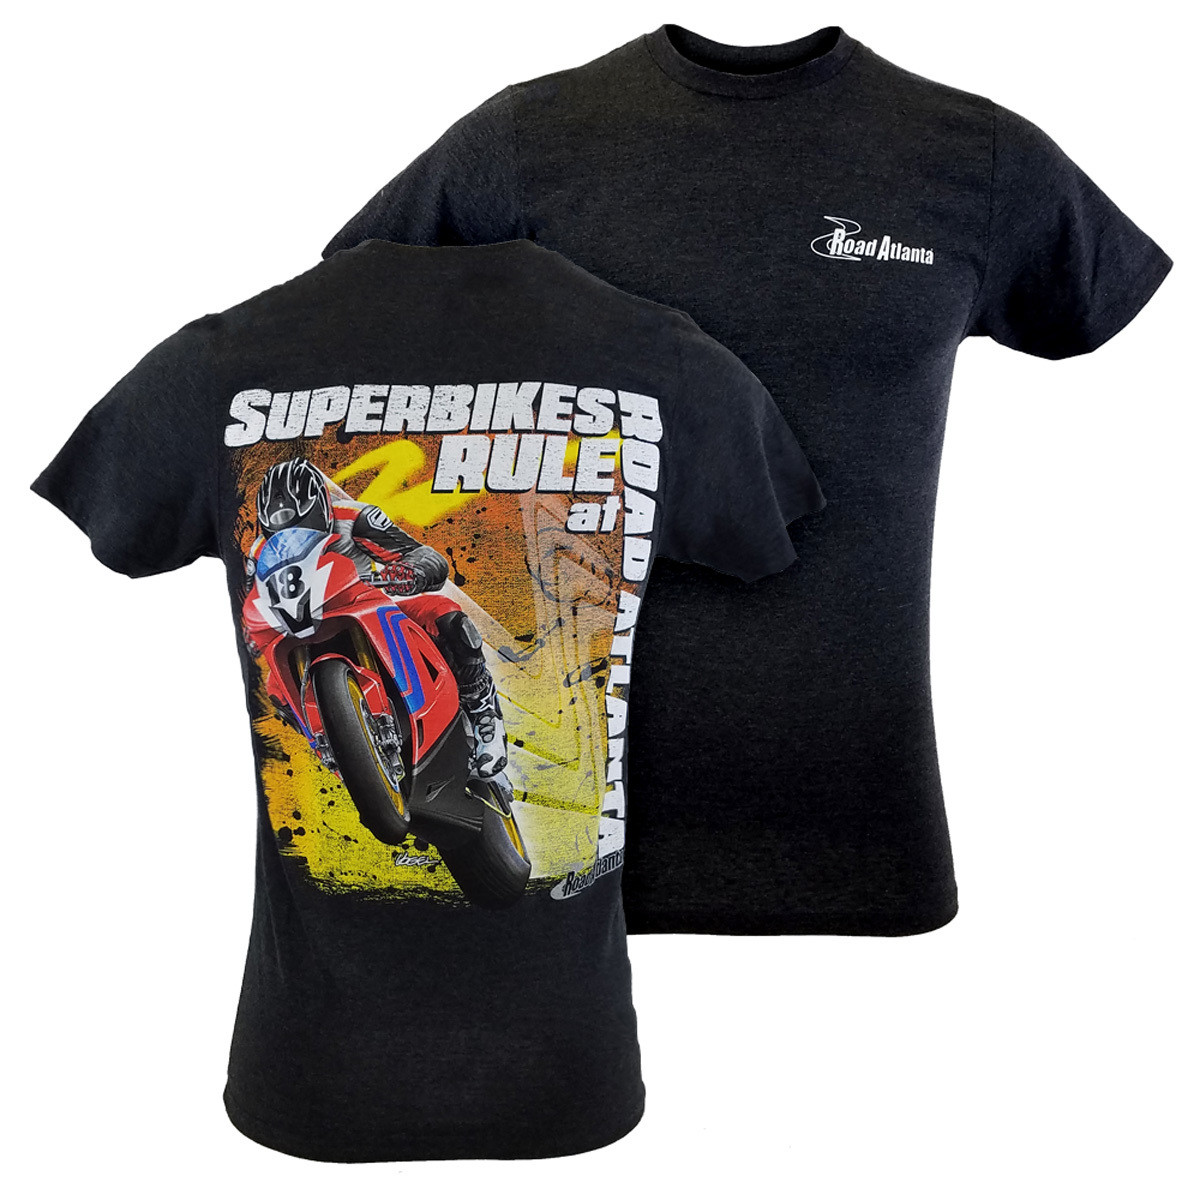 Superbikes Rule at Road Atlanta Tee